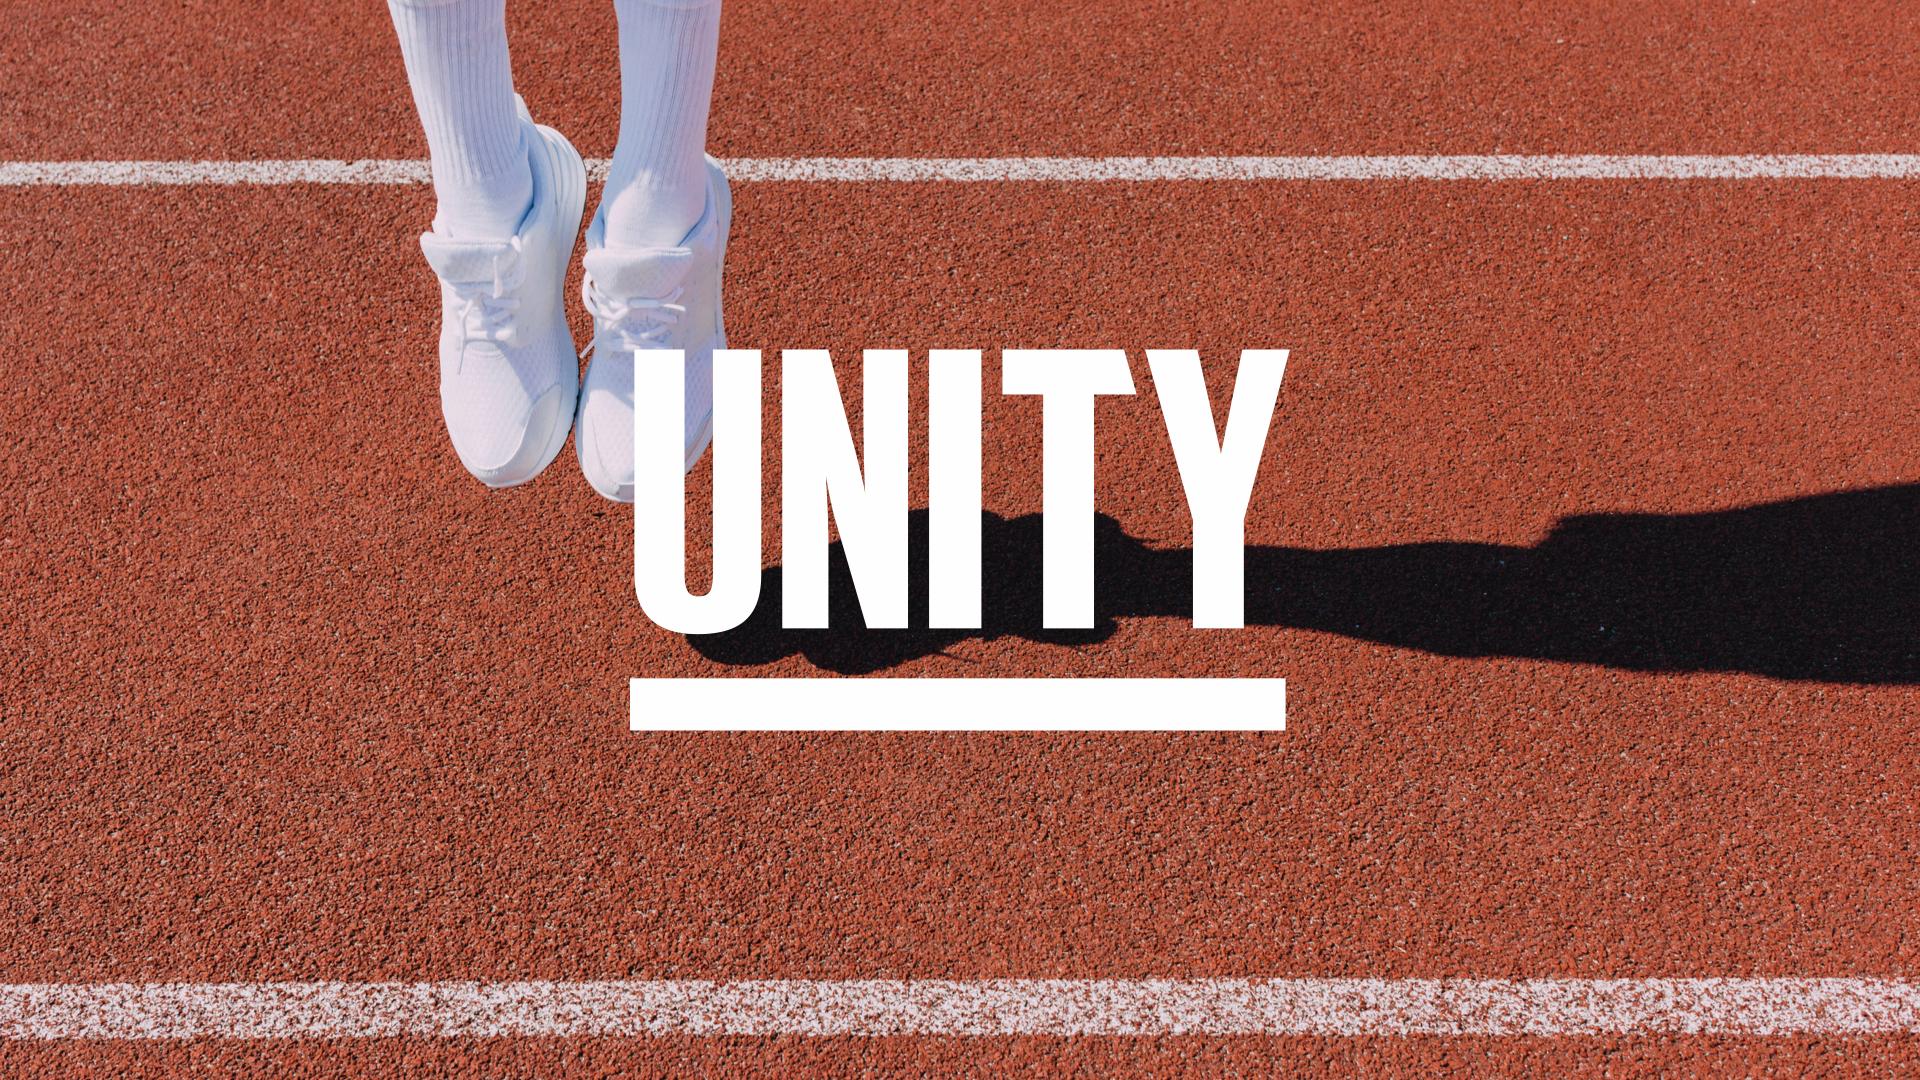 unity case study.004.jpeg